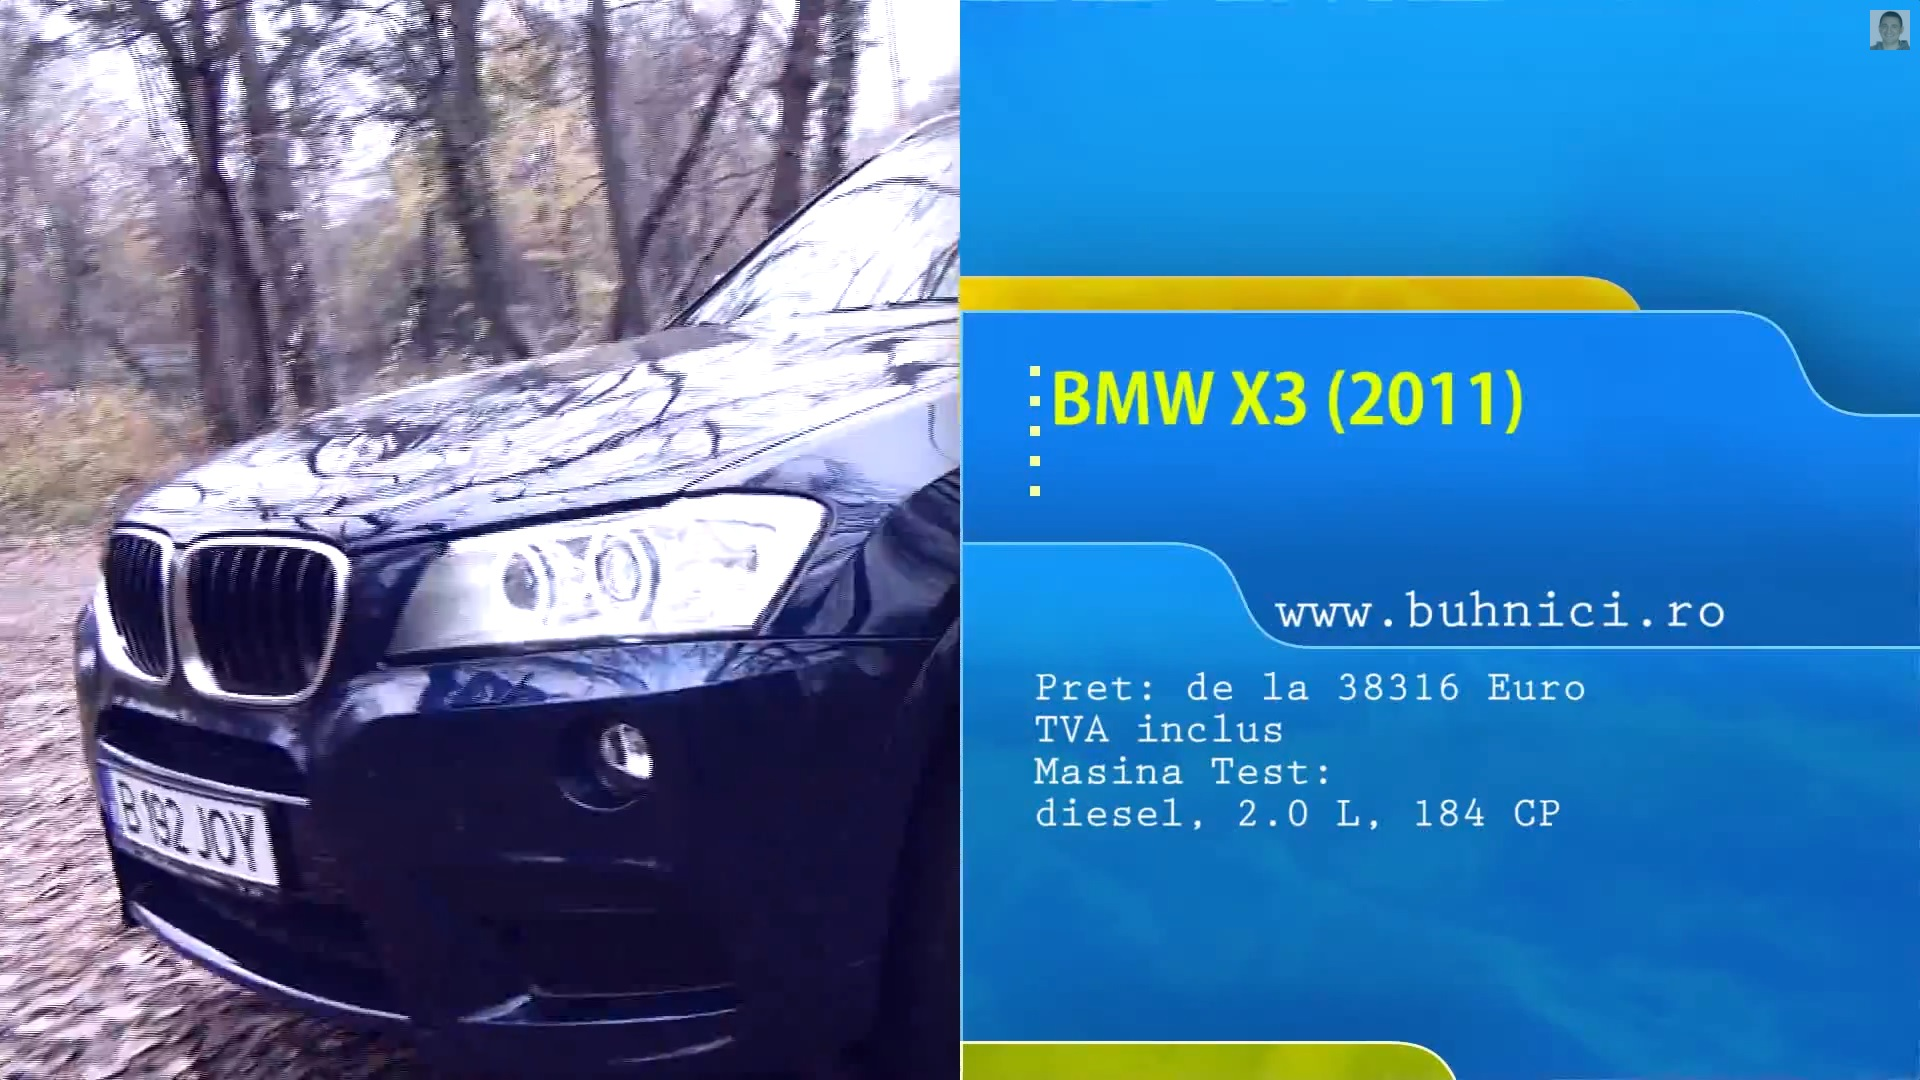 Video Bmw X3 2011 Mini Suv De 19 Tone George Buhnici